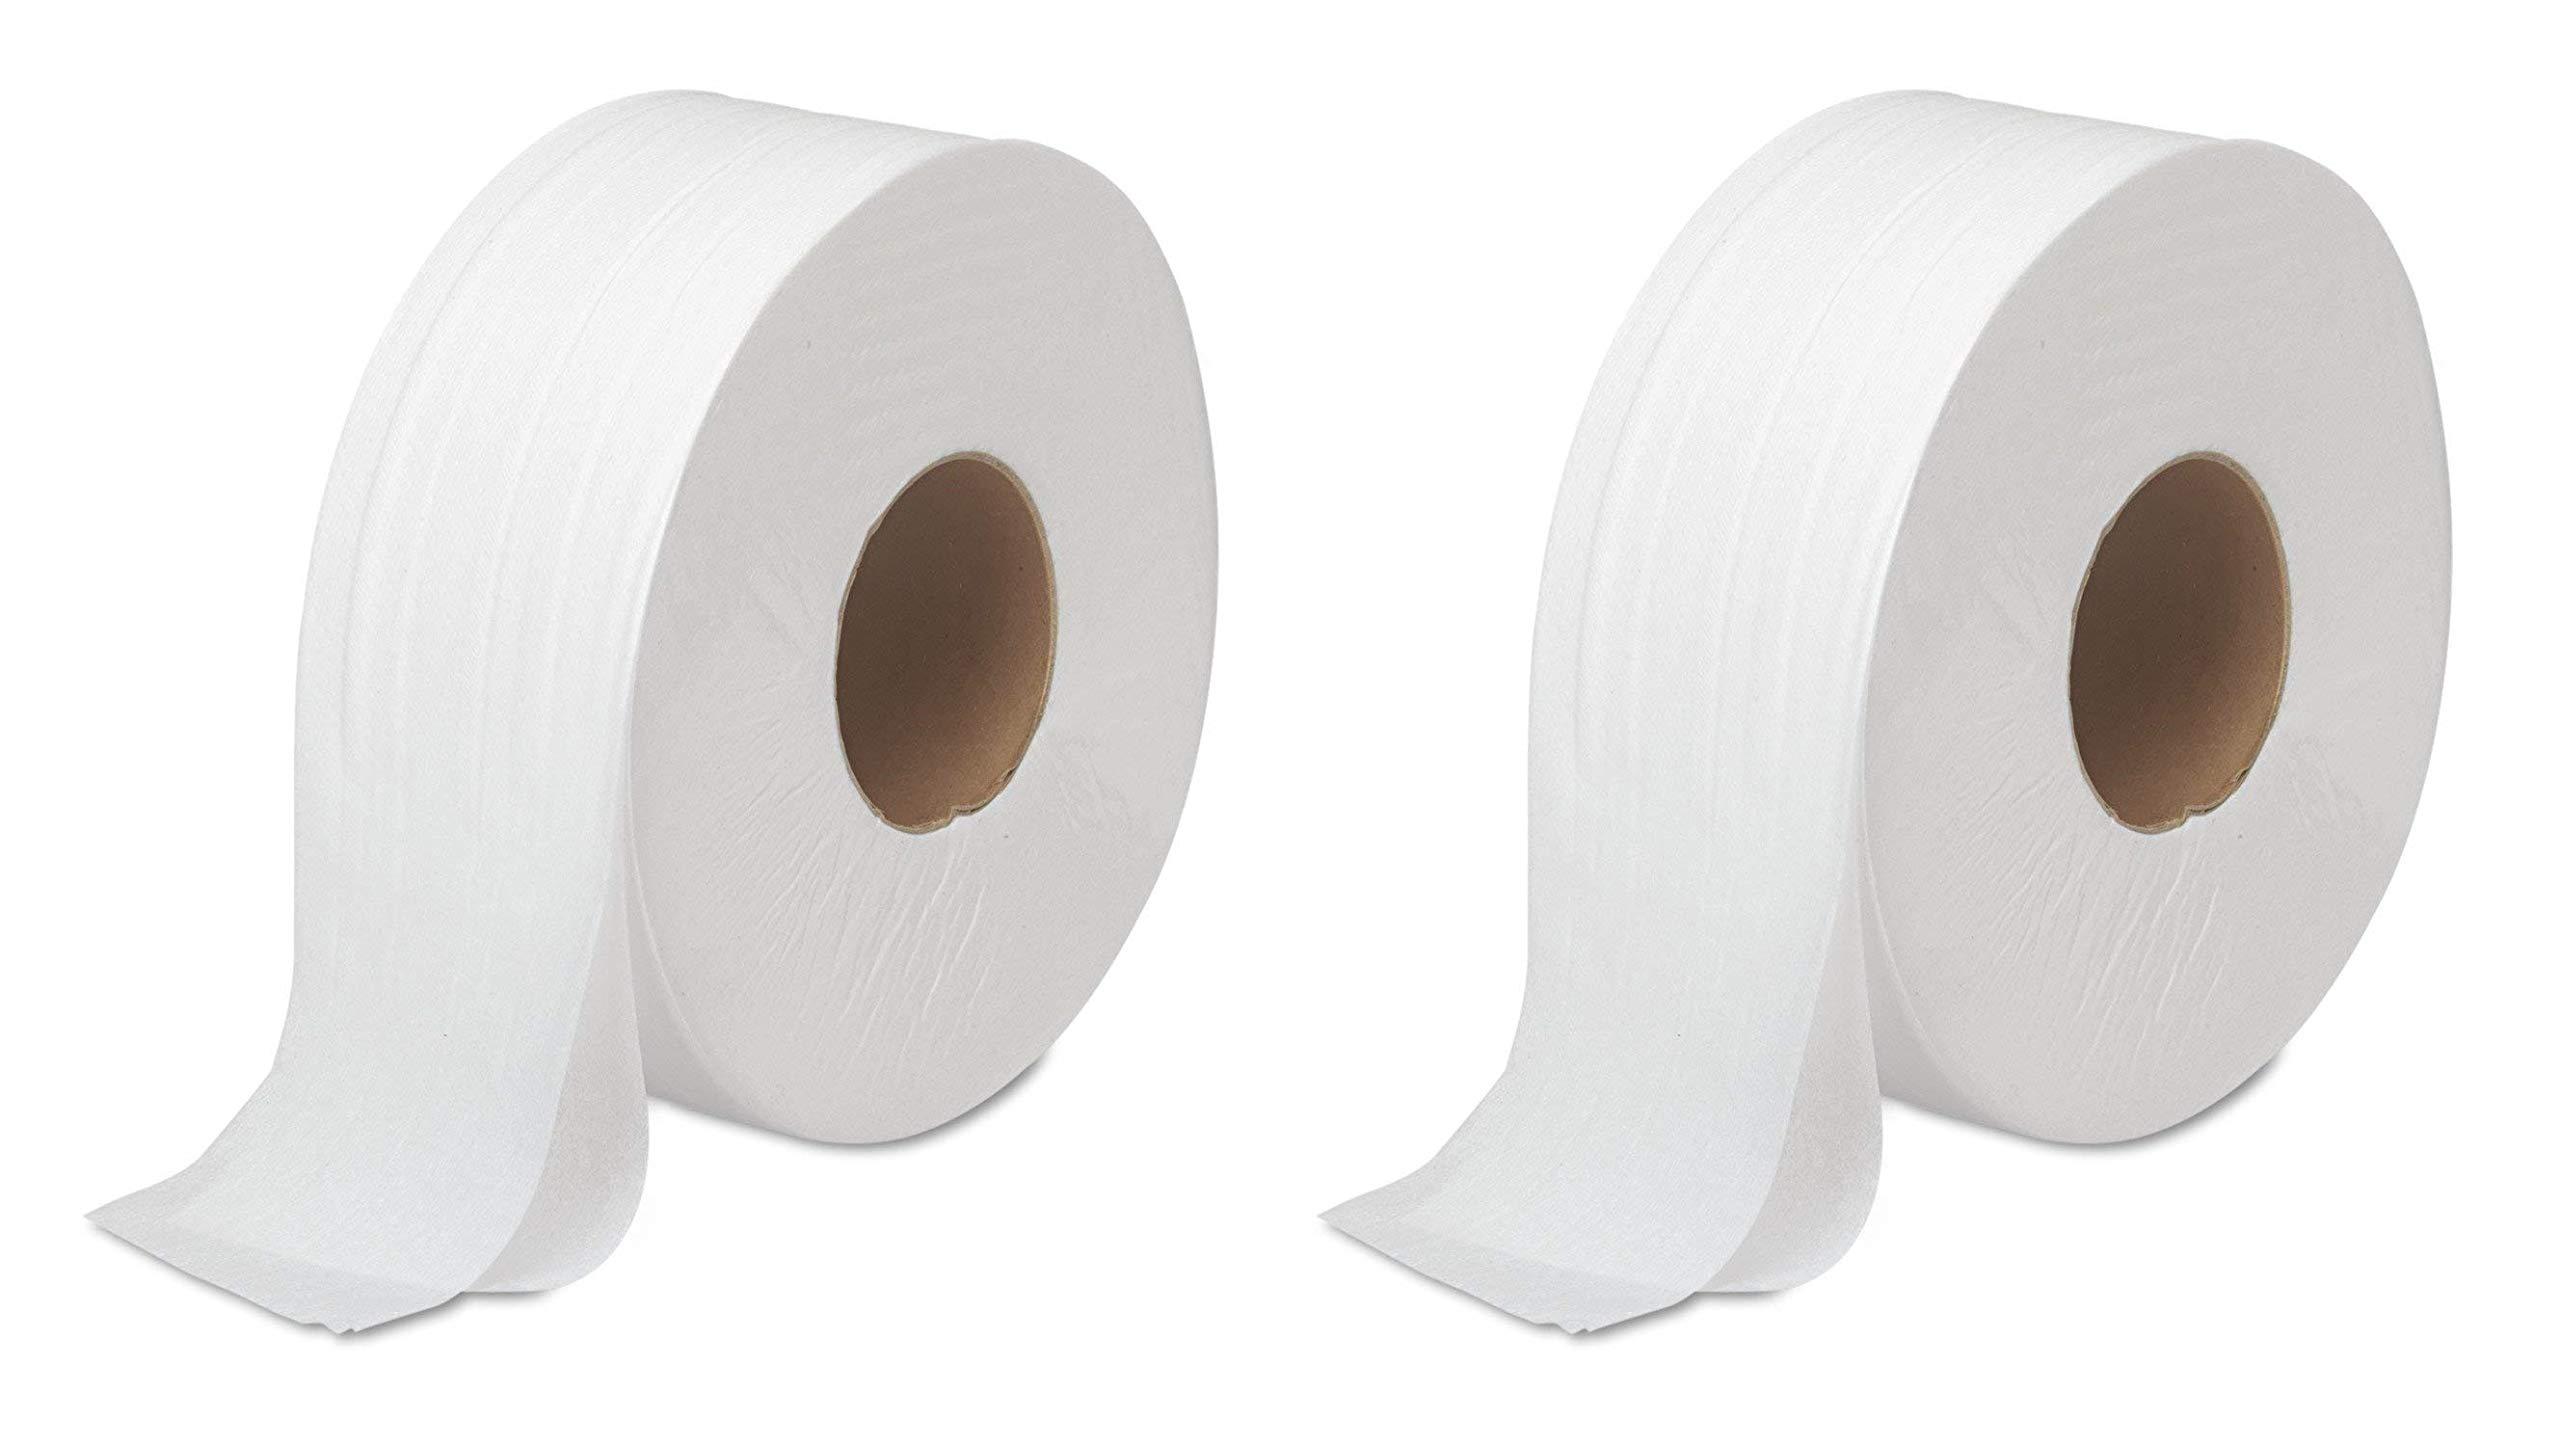 Boardwalk 6100 JRT Bath Tissue, Jumbo, 2-Ply, White, 1000 Ft/roll, 12 Rolls/Carton